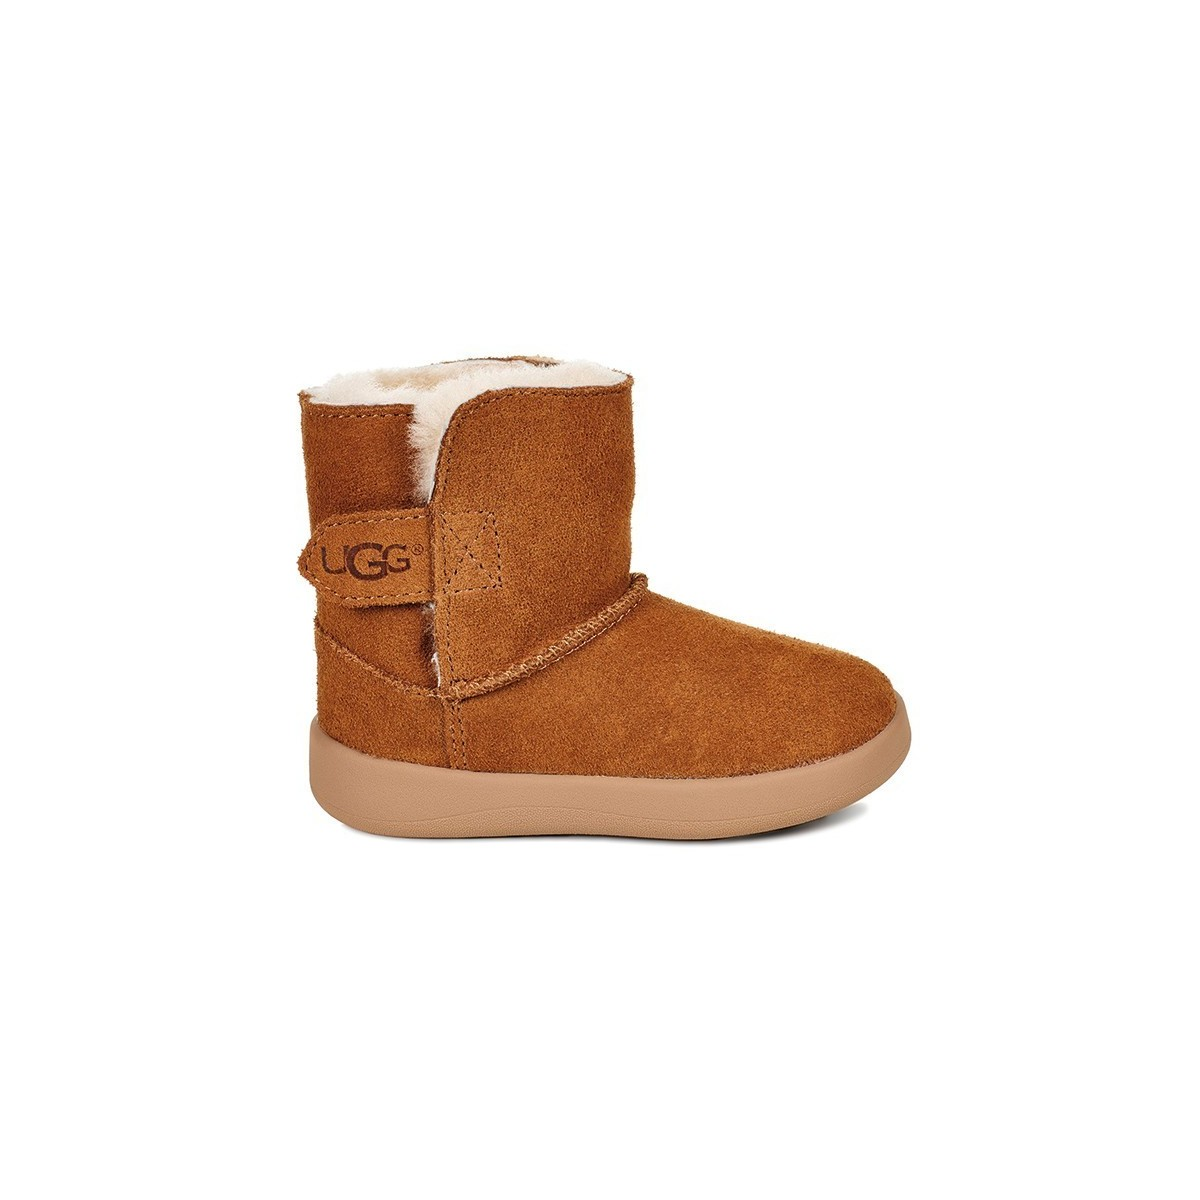 Boots Ugg Keelan peau camel